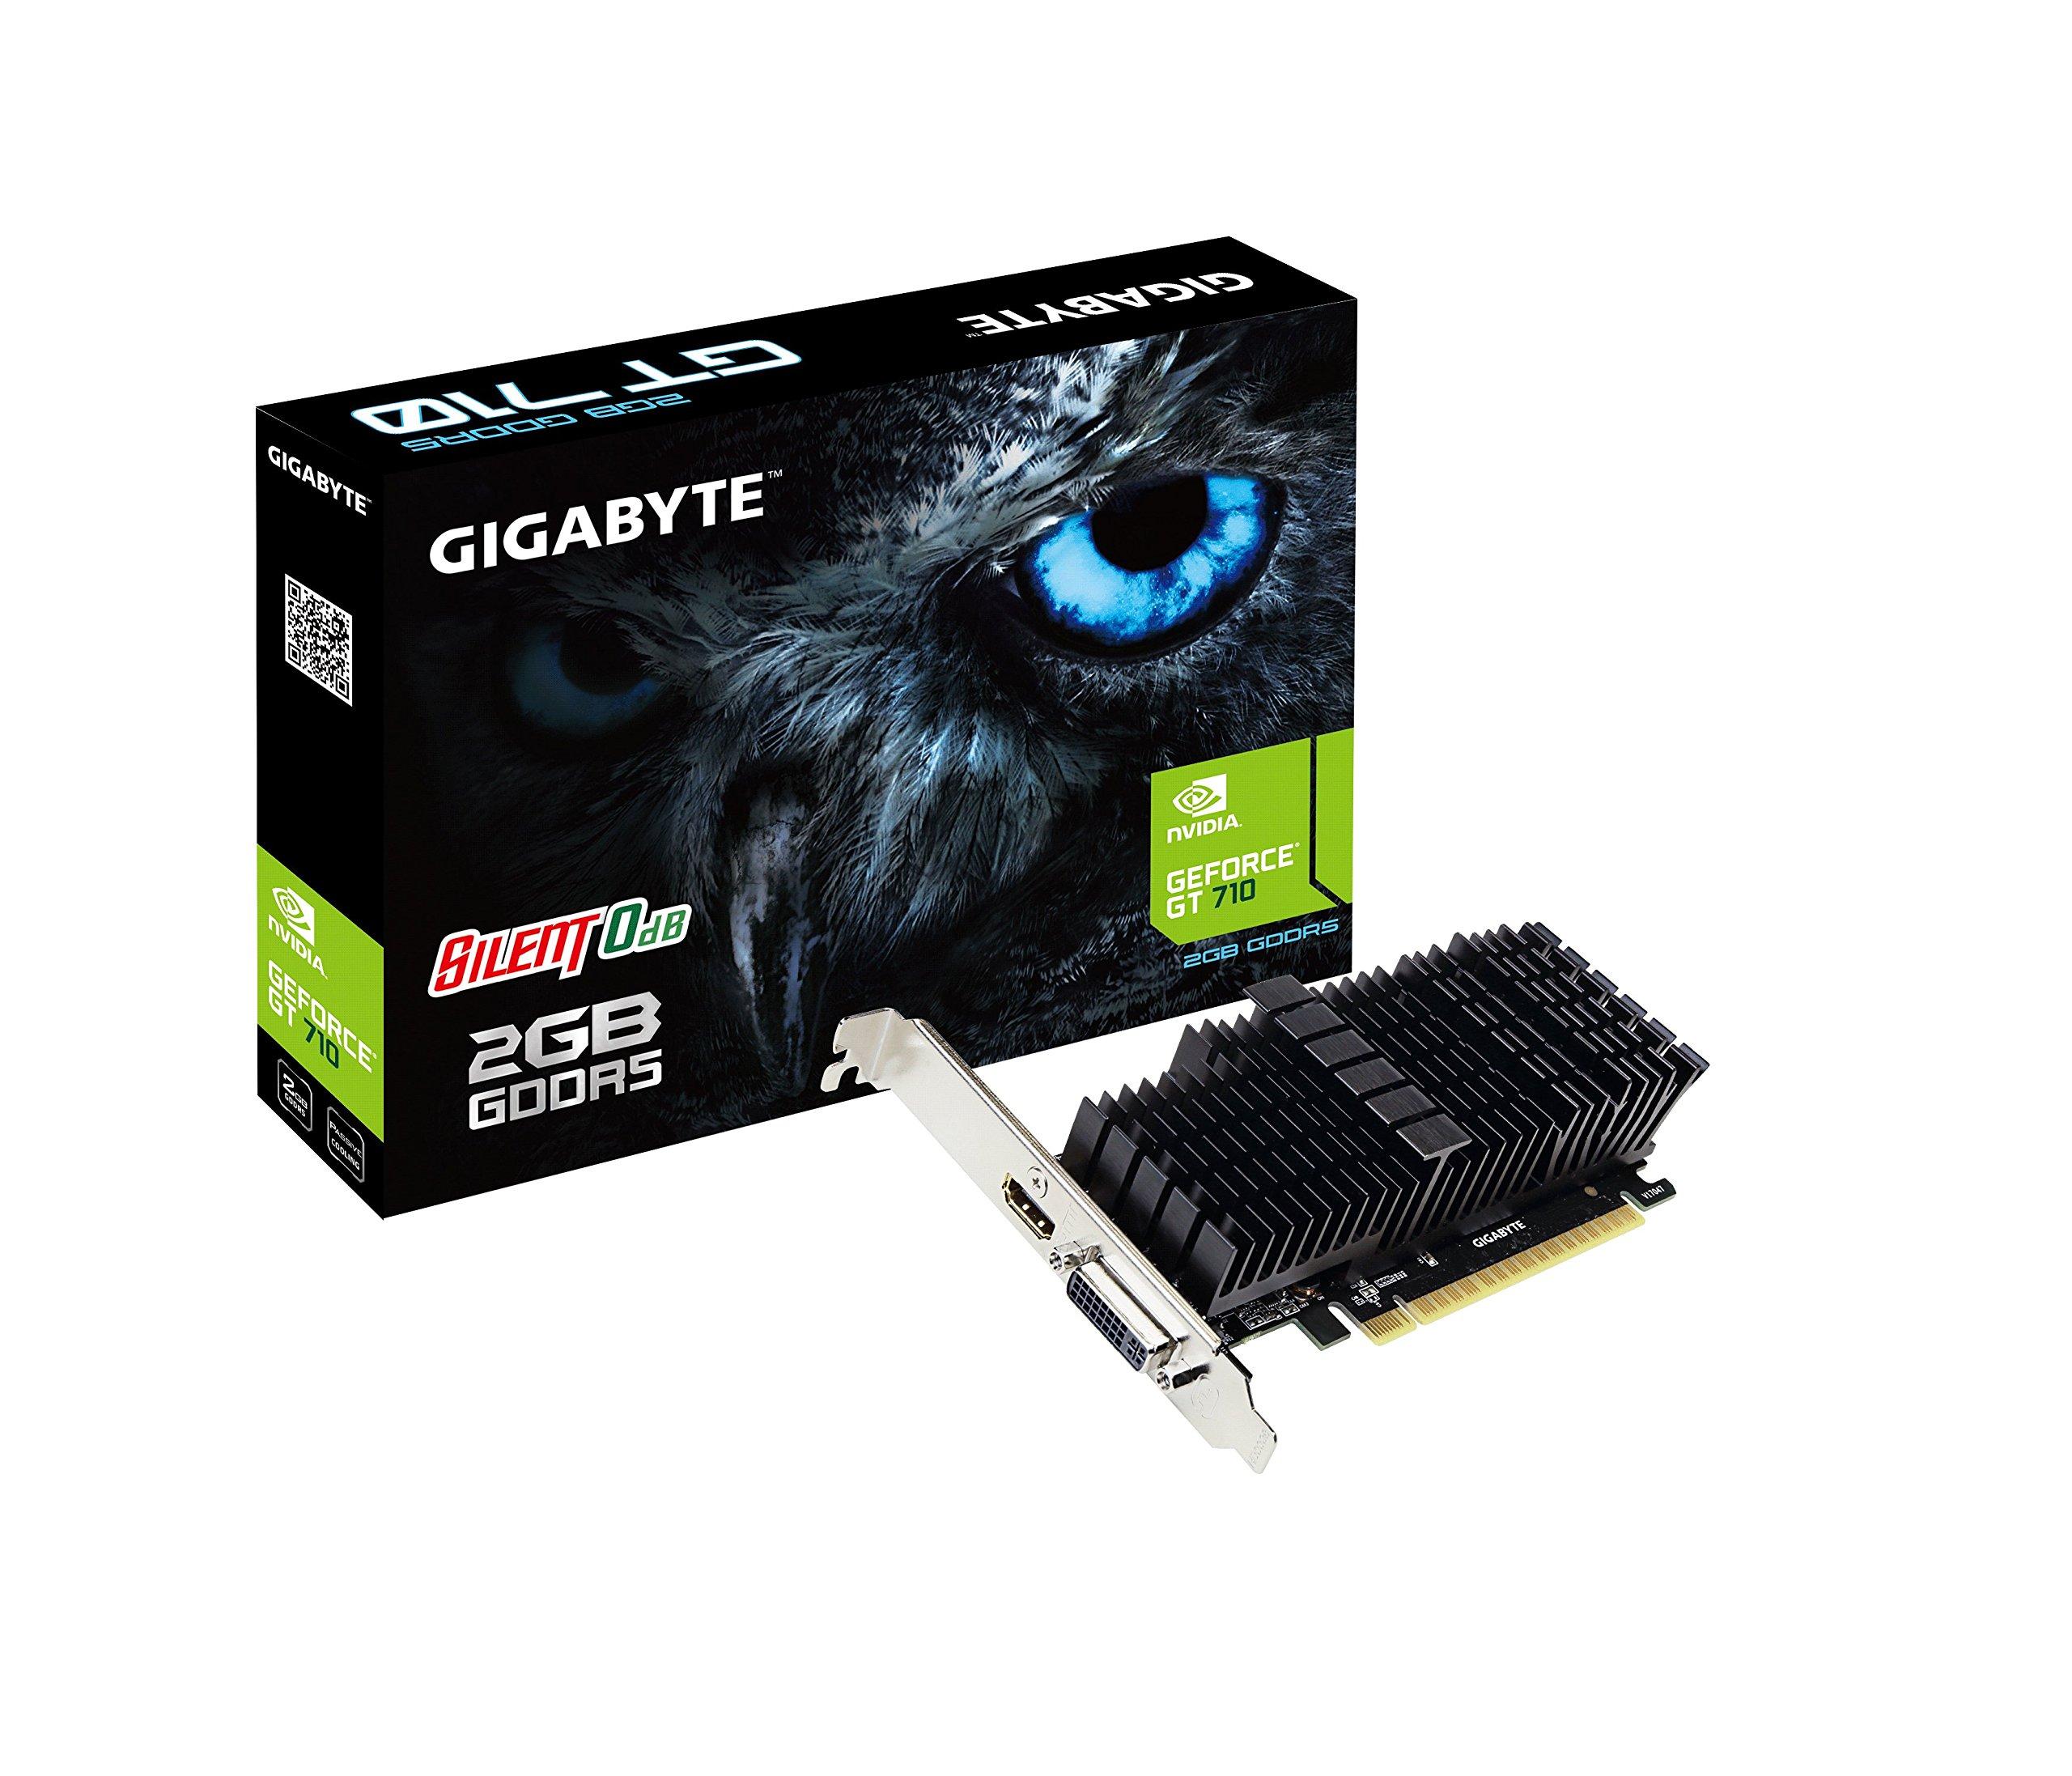 Gigabyte GeForce GT 710 2GB Graphic Cards GV-N710D5SL-2GL